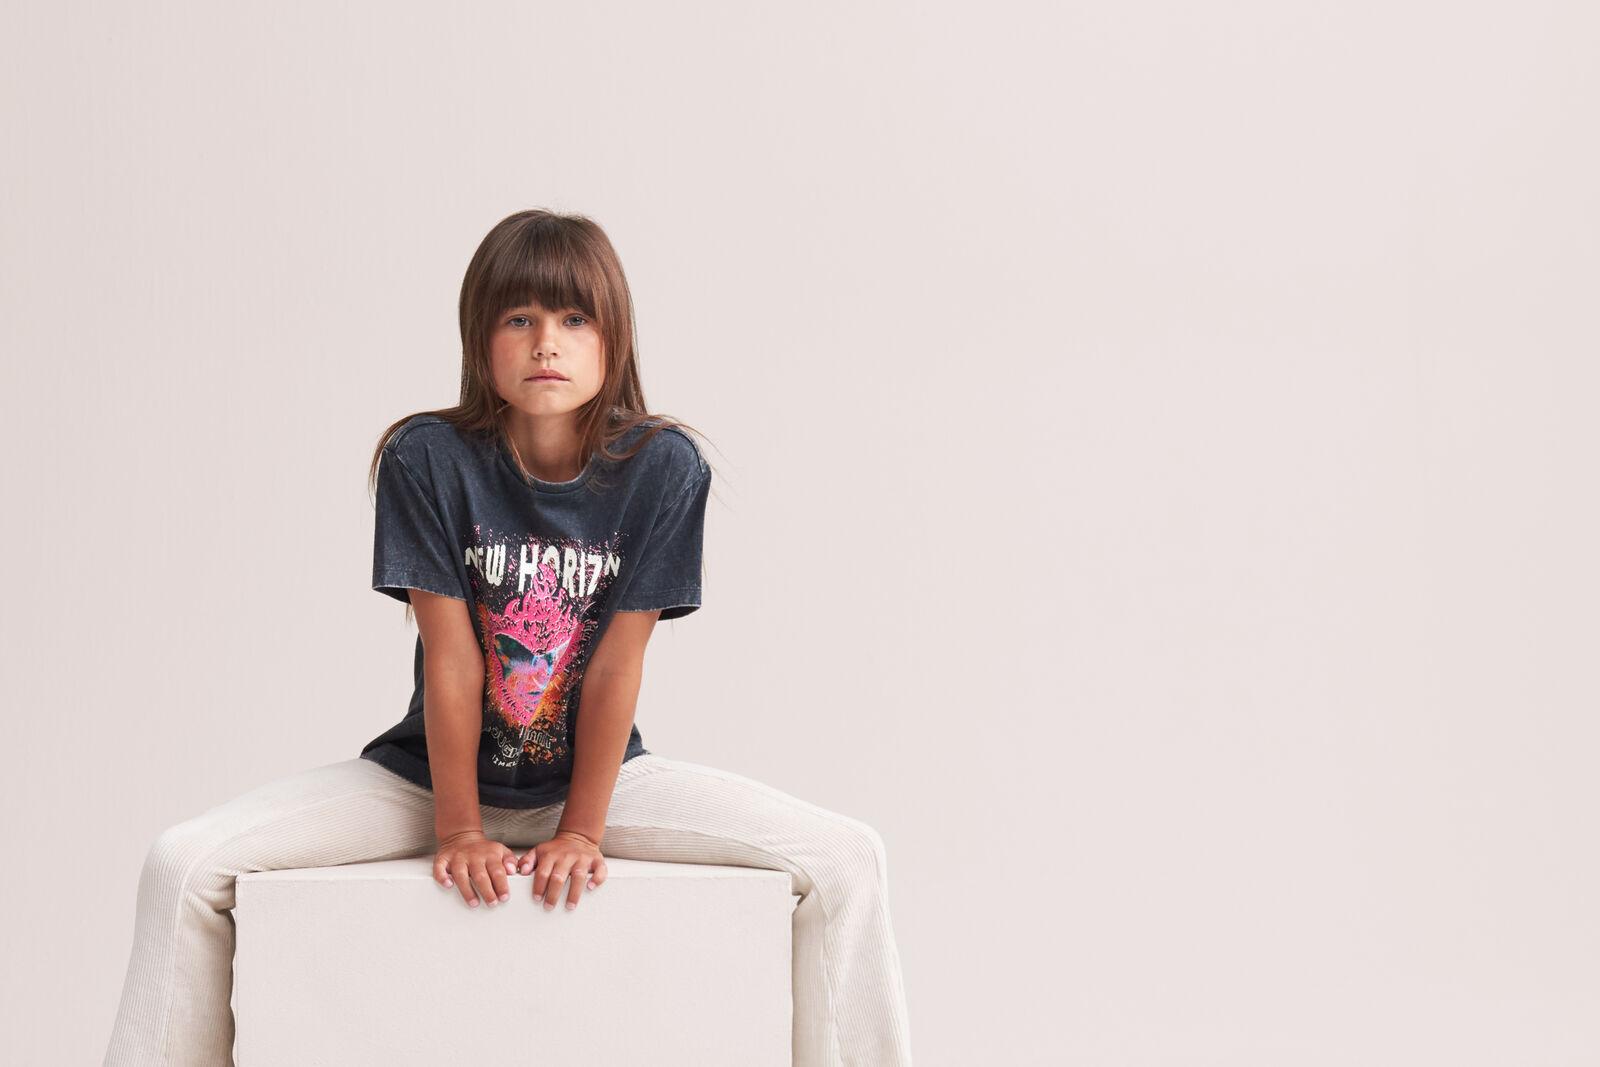 Bridget T-shirt